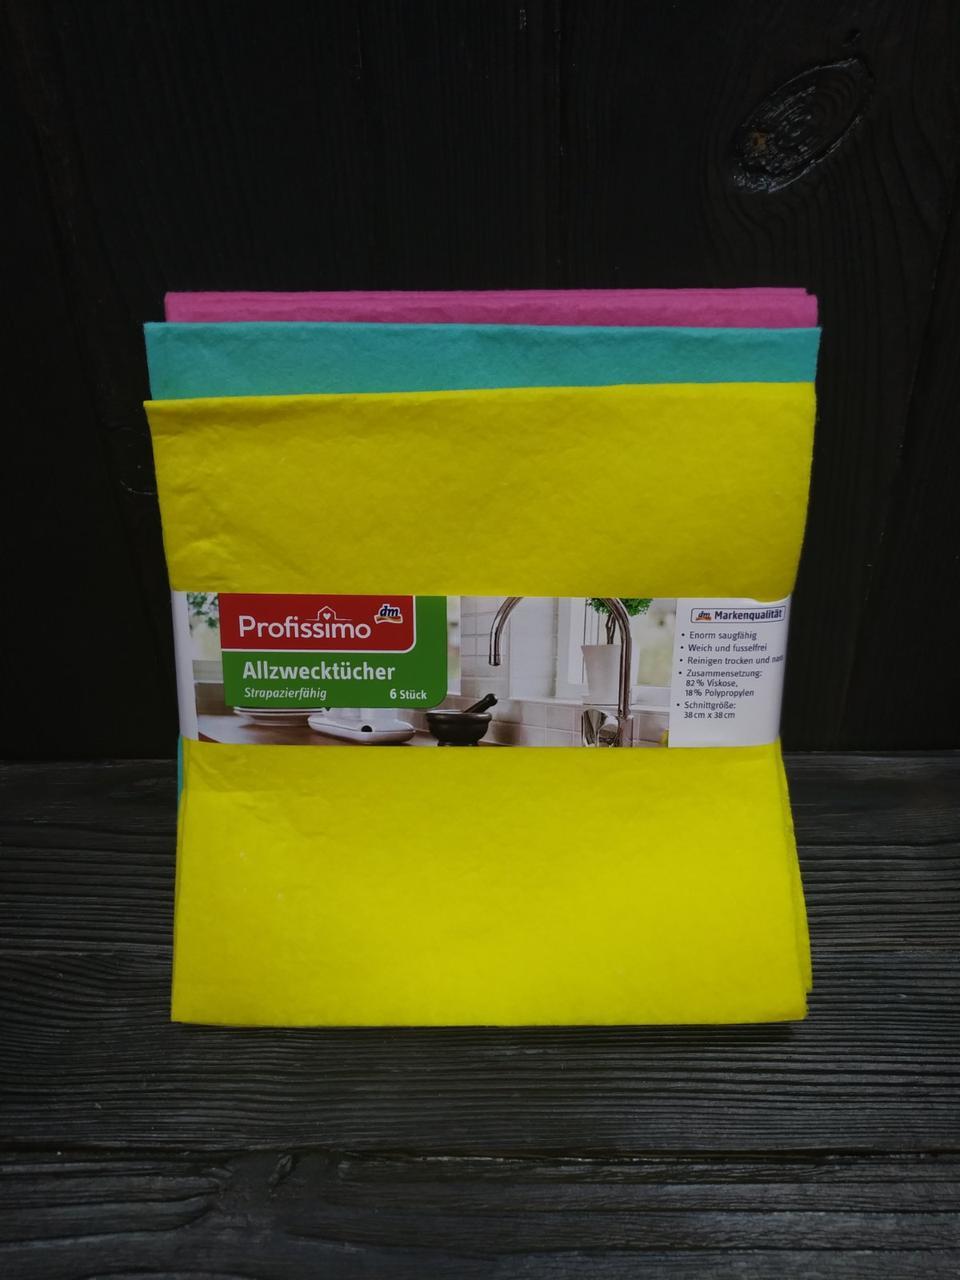 Denkmit Profissimo салфетки для уборки 6 шт